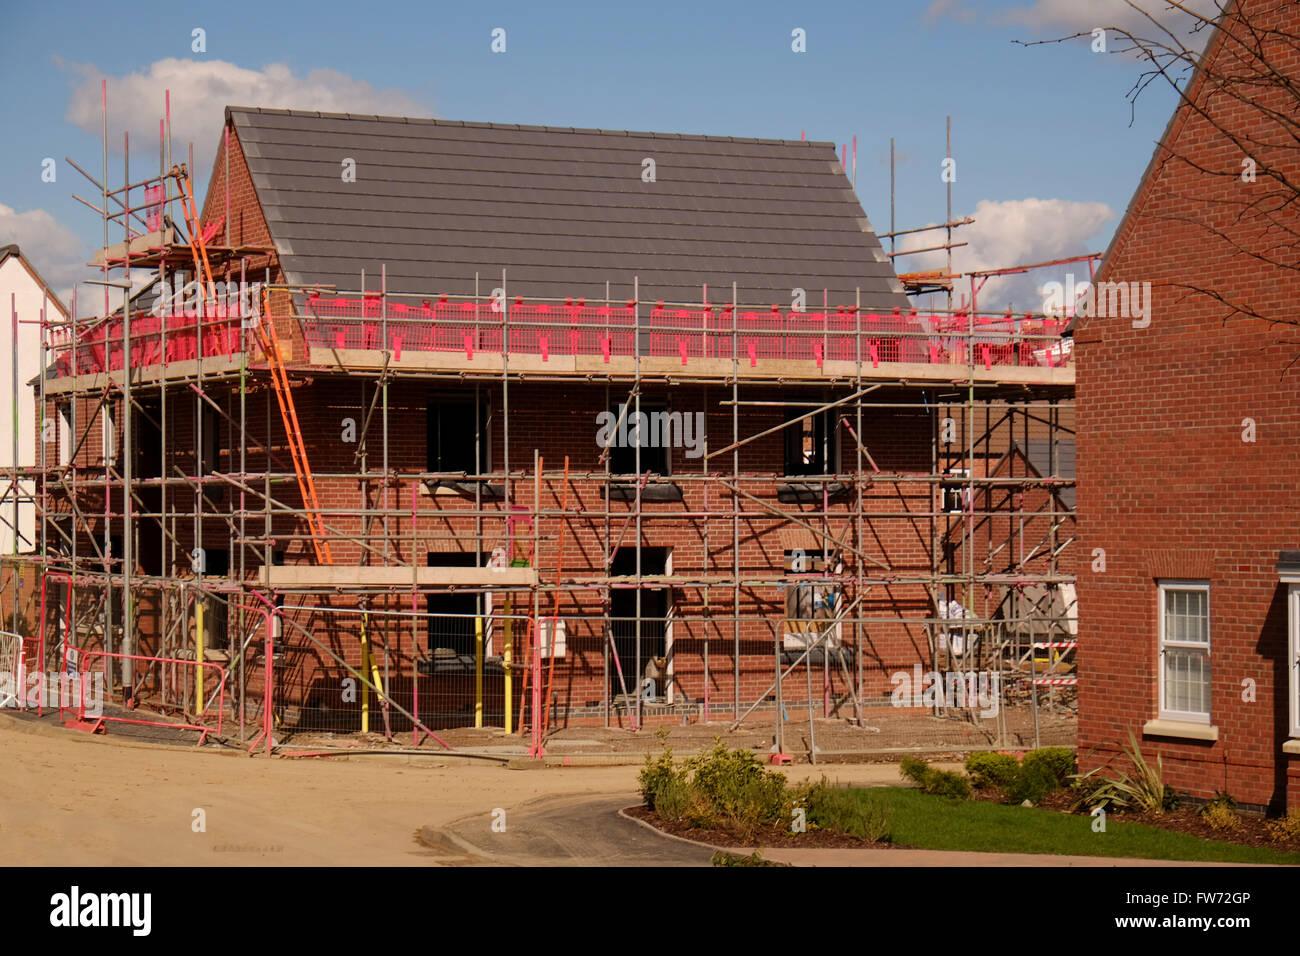 Neues Haus abgedeckt im Gerüstbau, Grantham, Lincolnshire, England, UK Stockbild